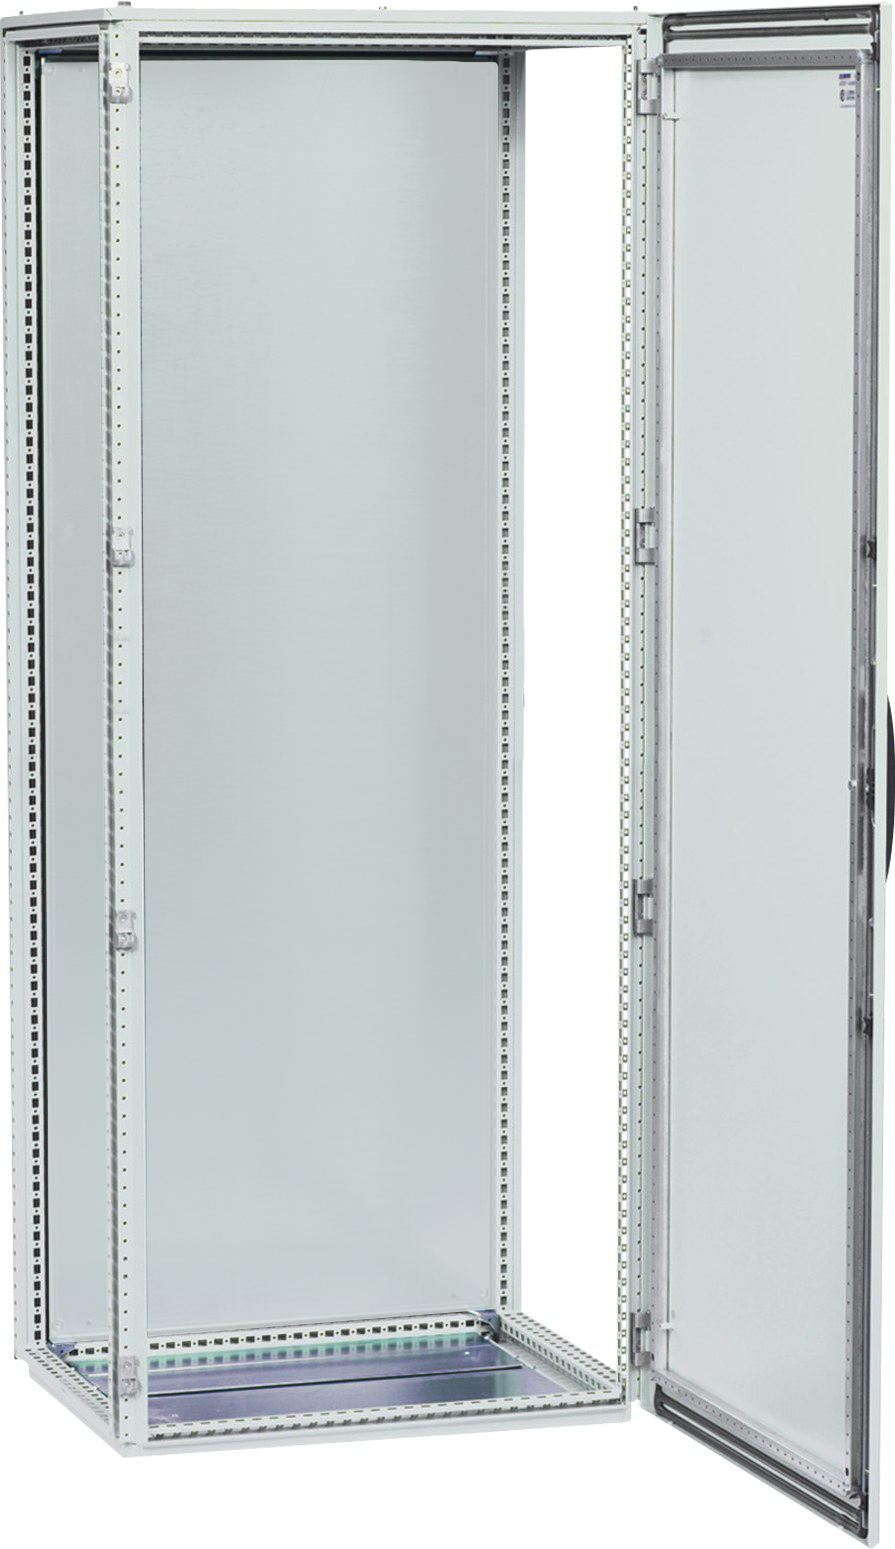 1 Stk Anreihschrank 1-türig, 2000x600x400mm, RAL 7035 AS206041-5